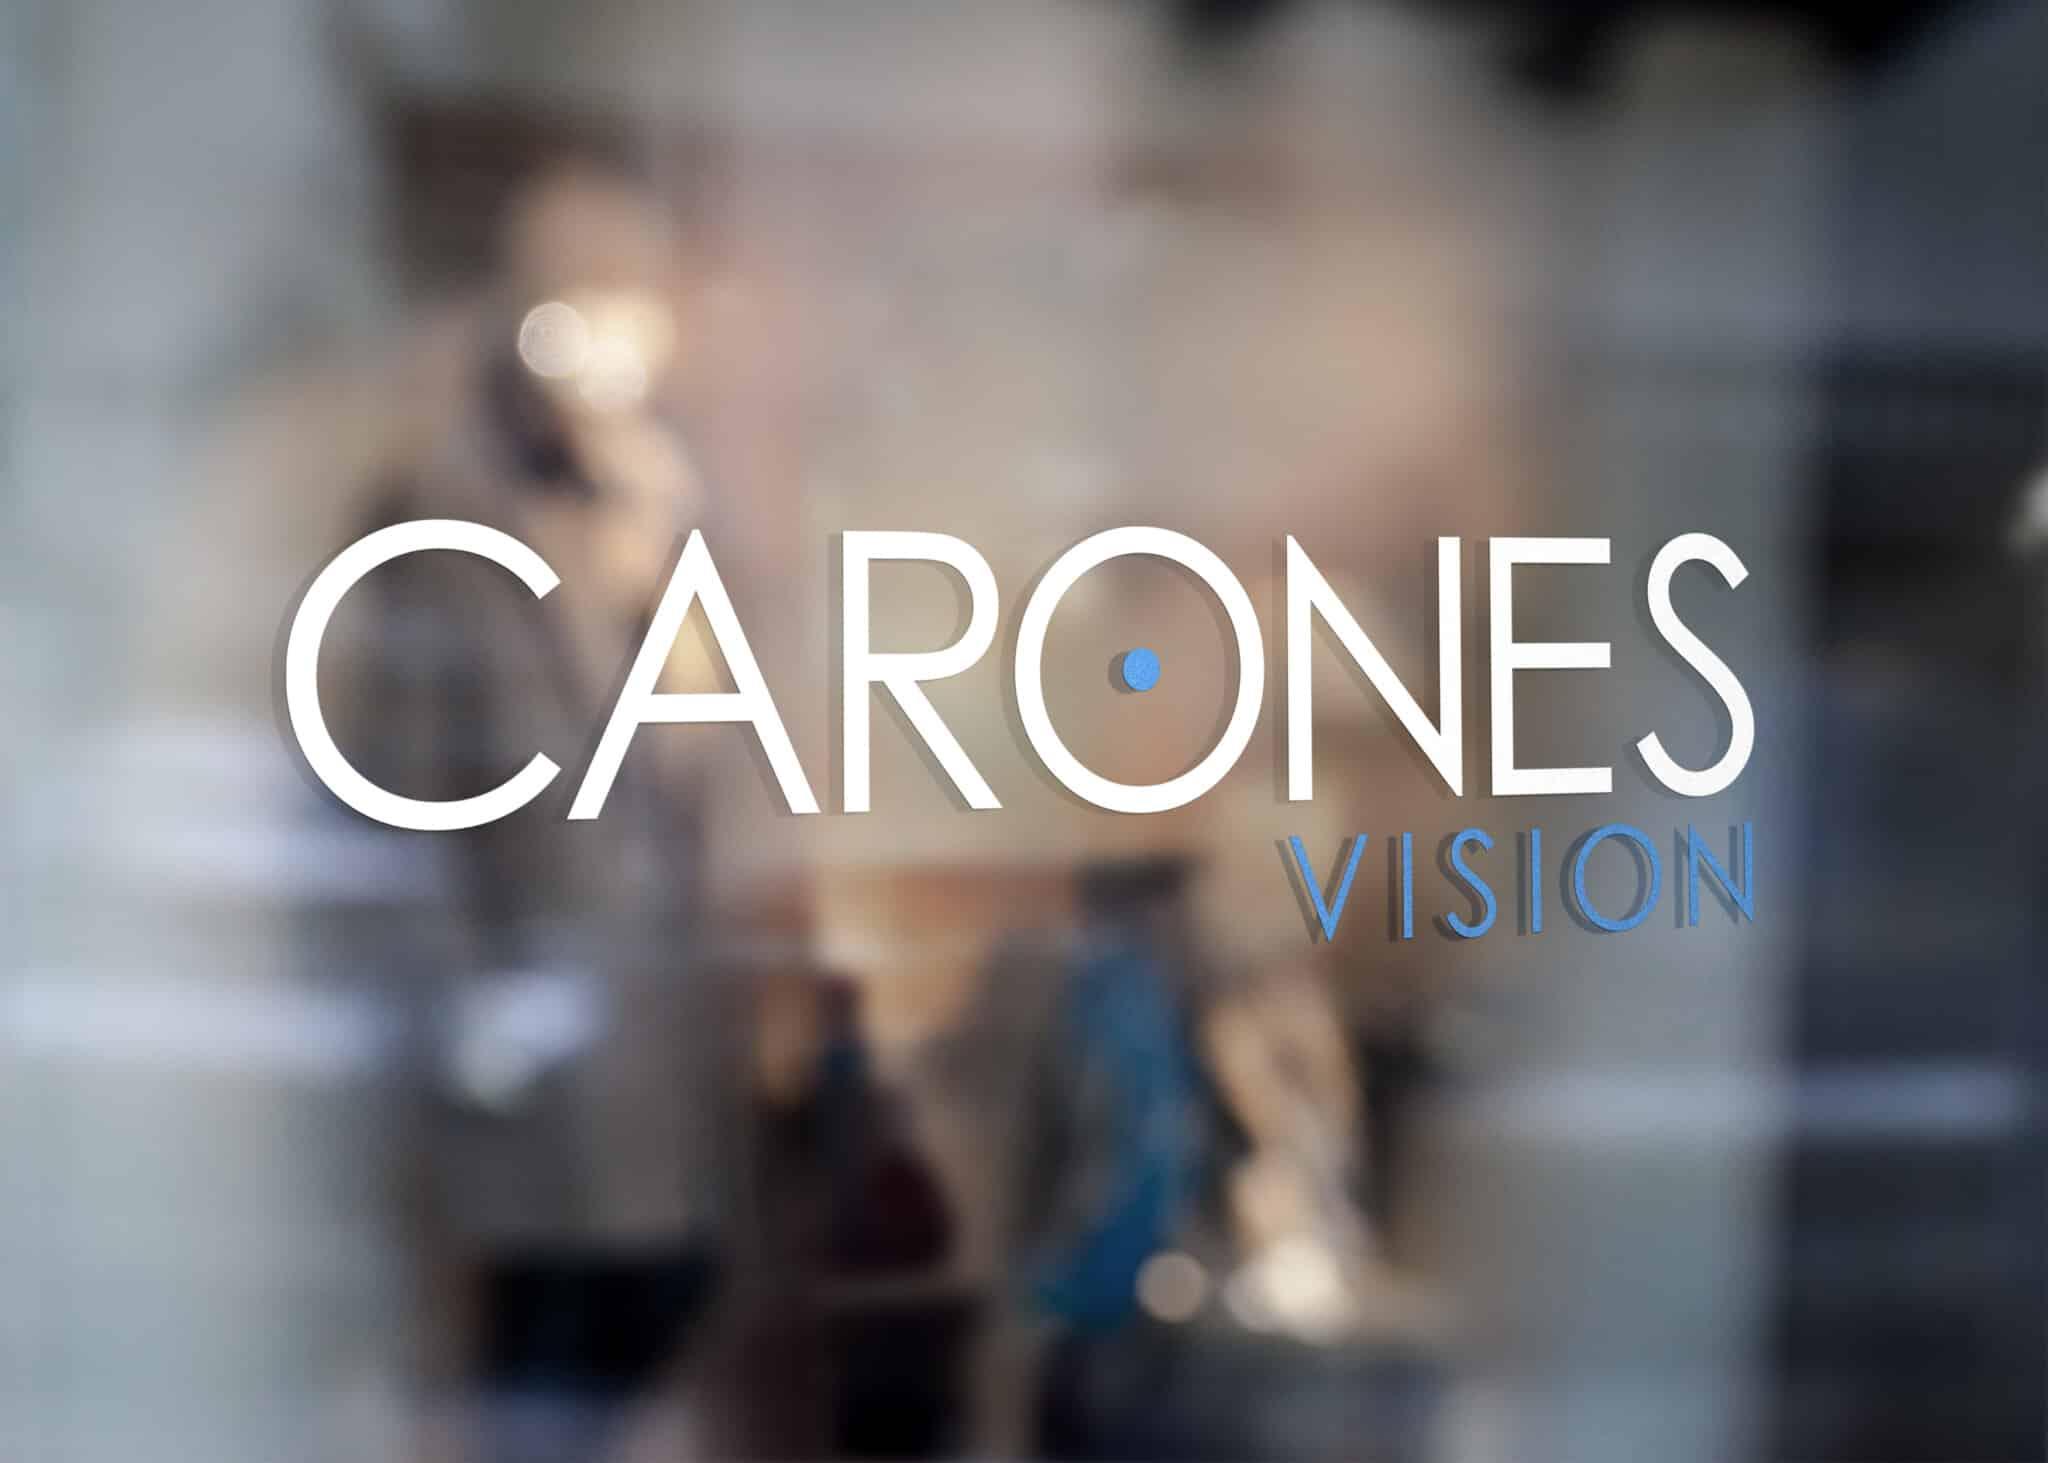 logo Carones vetrofania